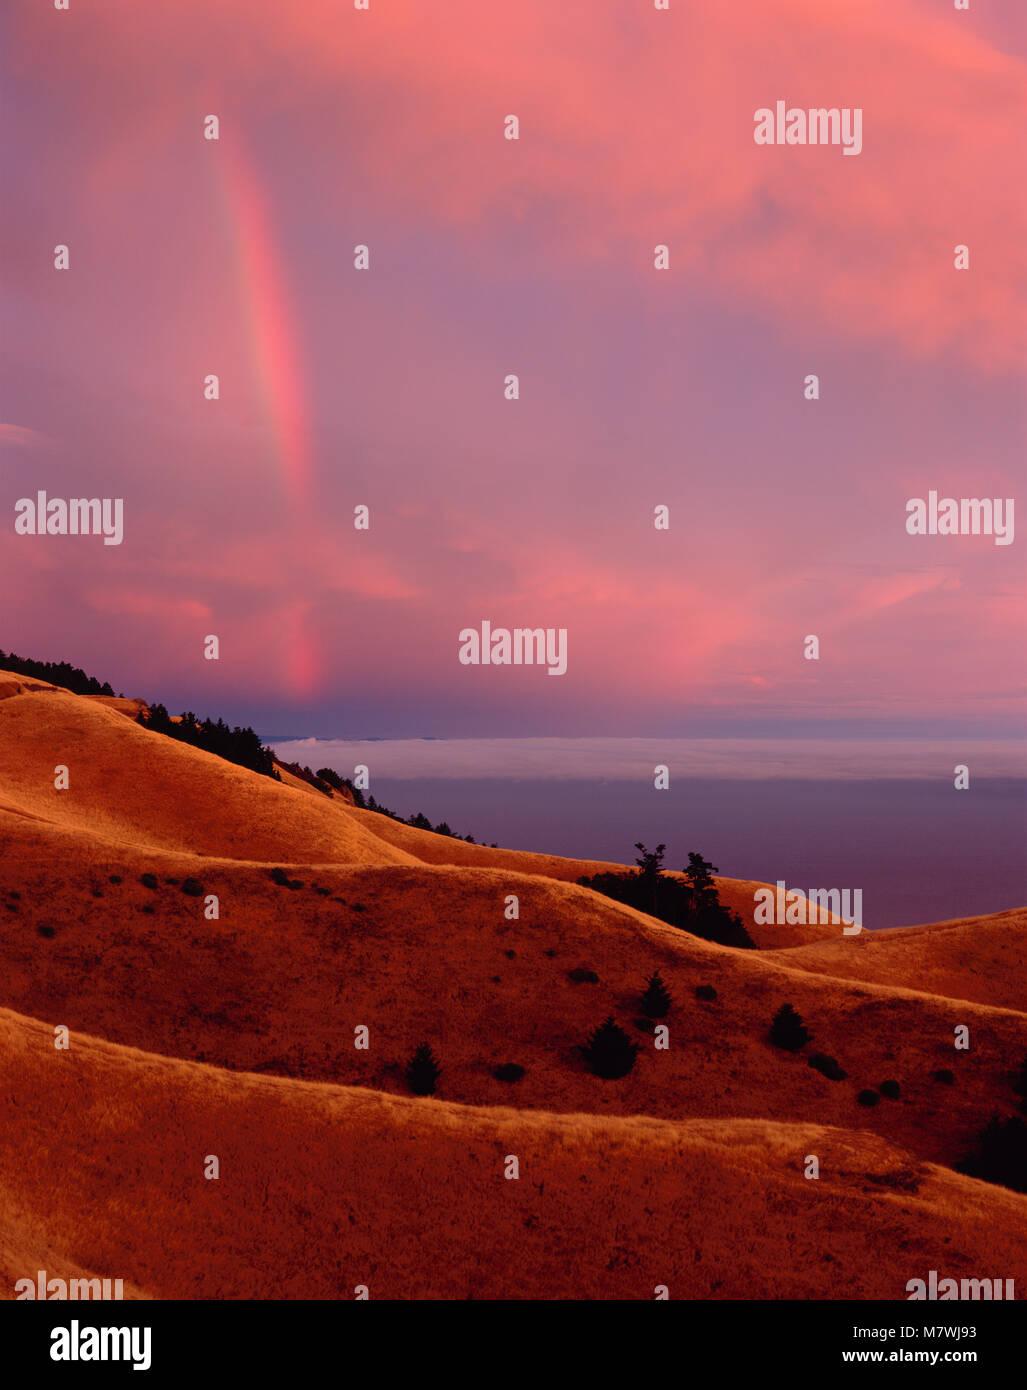 Rainbow, Bolinas Ridge, Mount Tamalpais State Park, Golden Gate National Recreation Area, Marin County, California - Stock Image